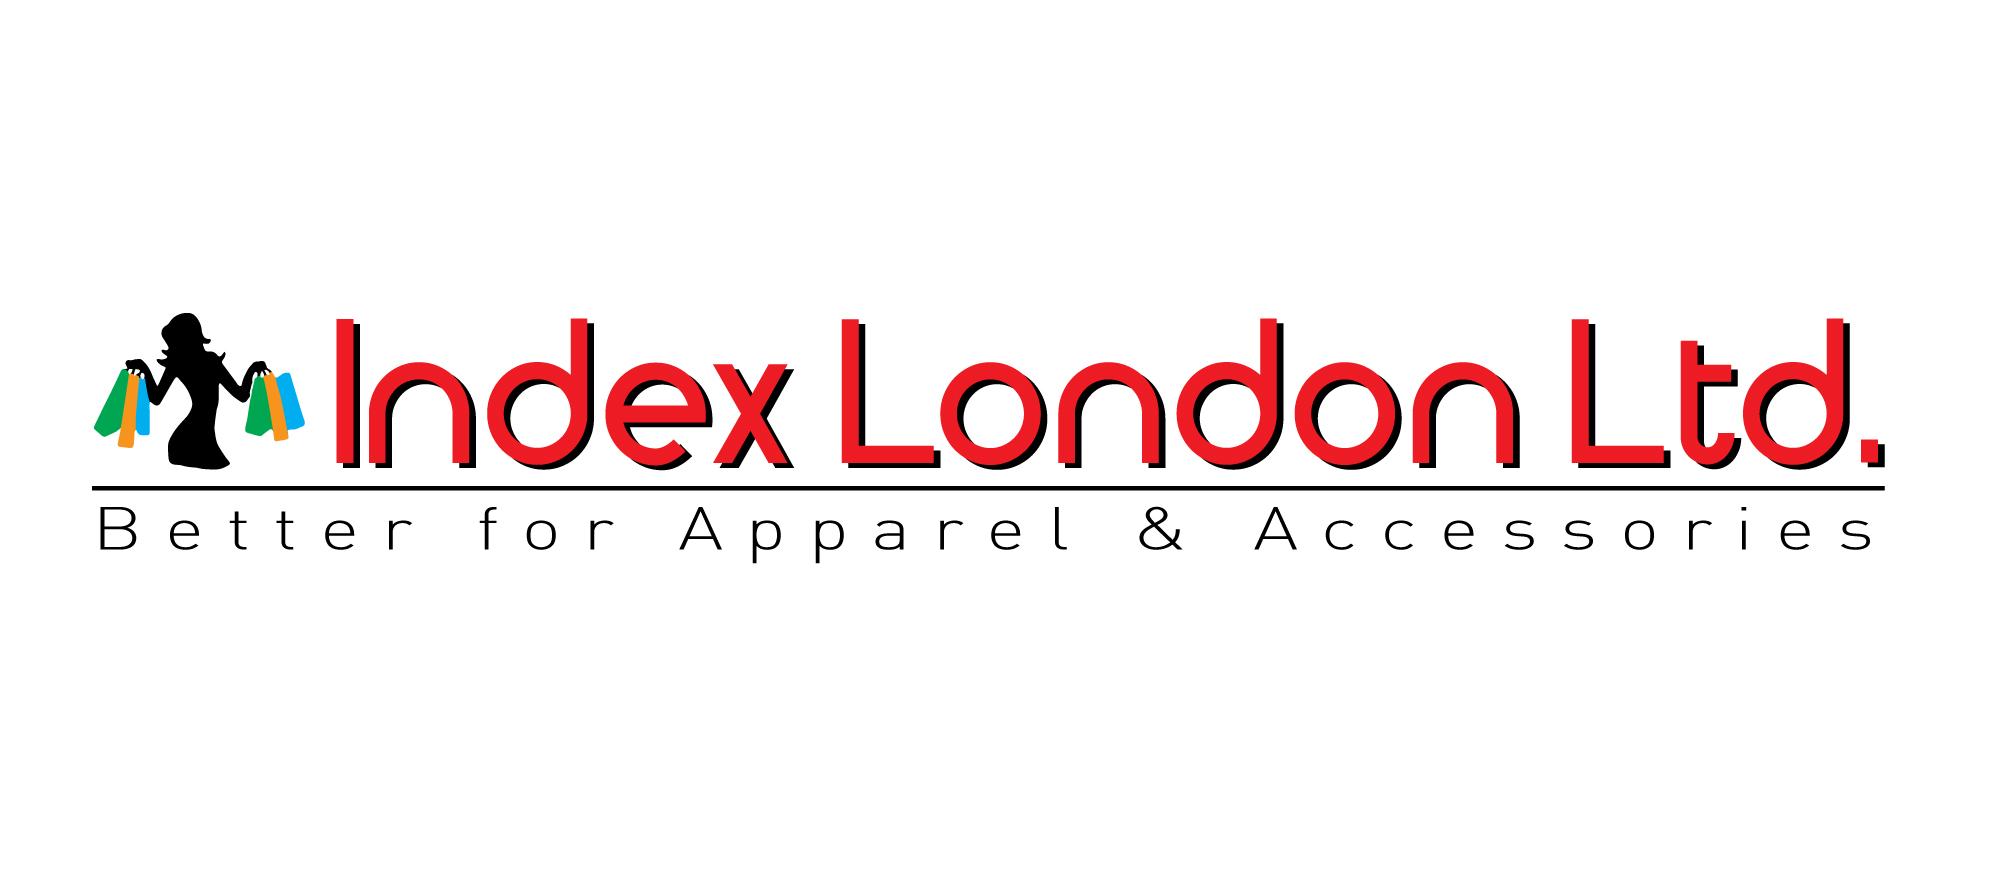 Index London